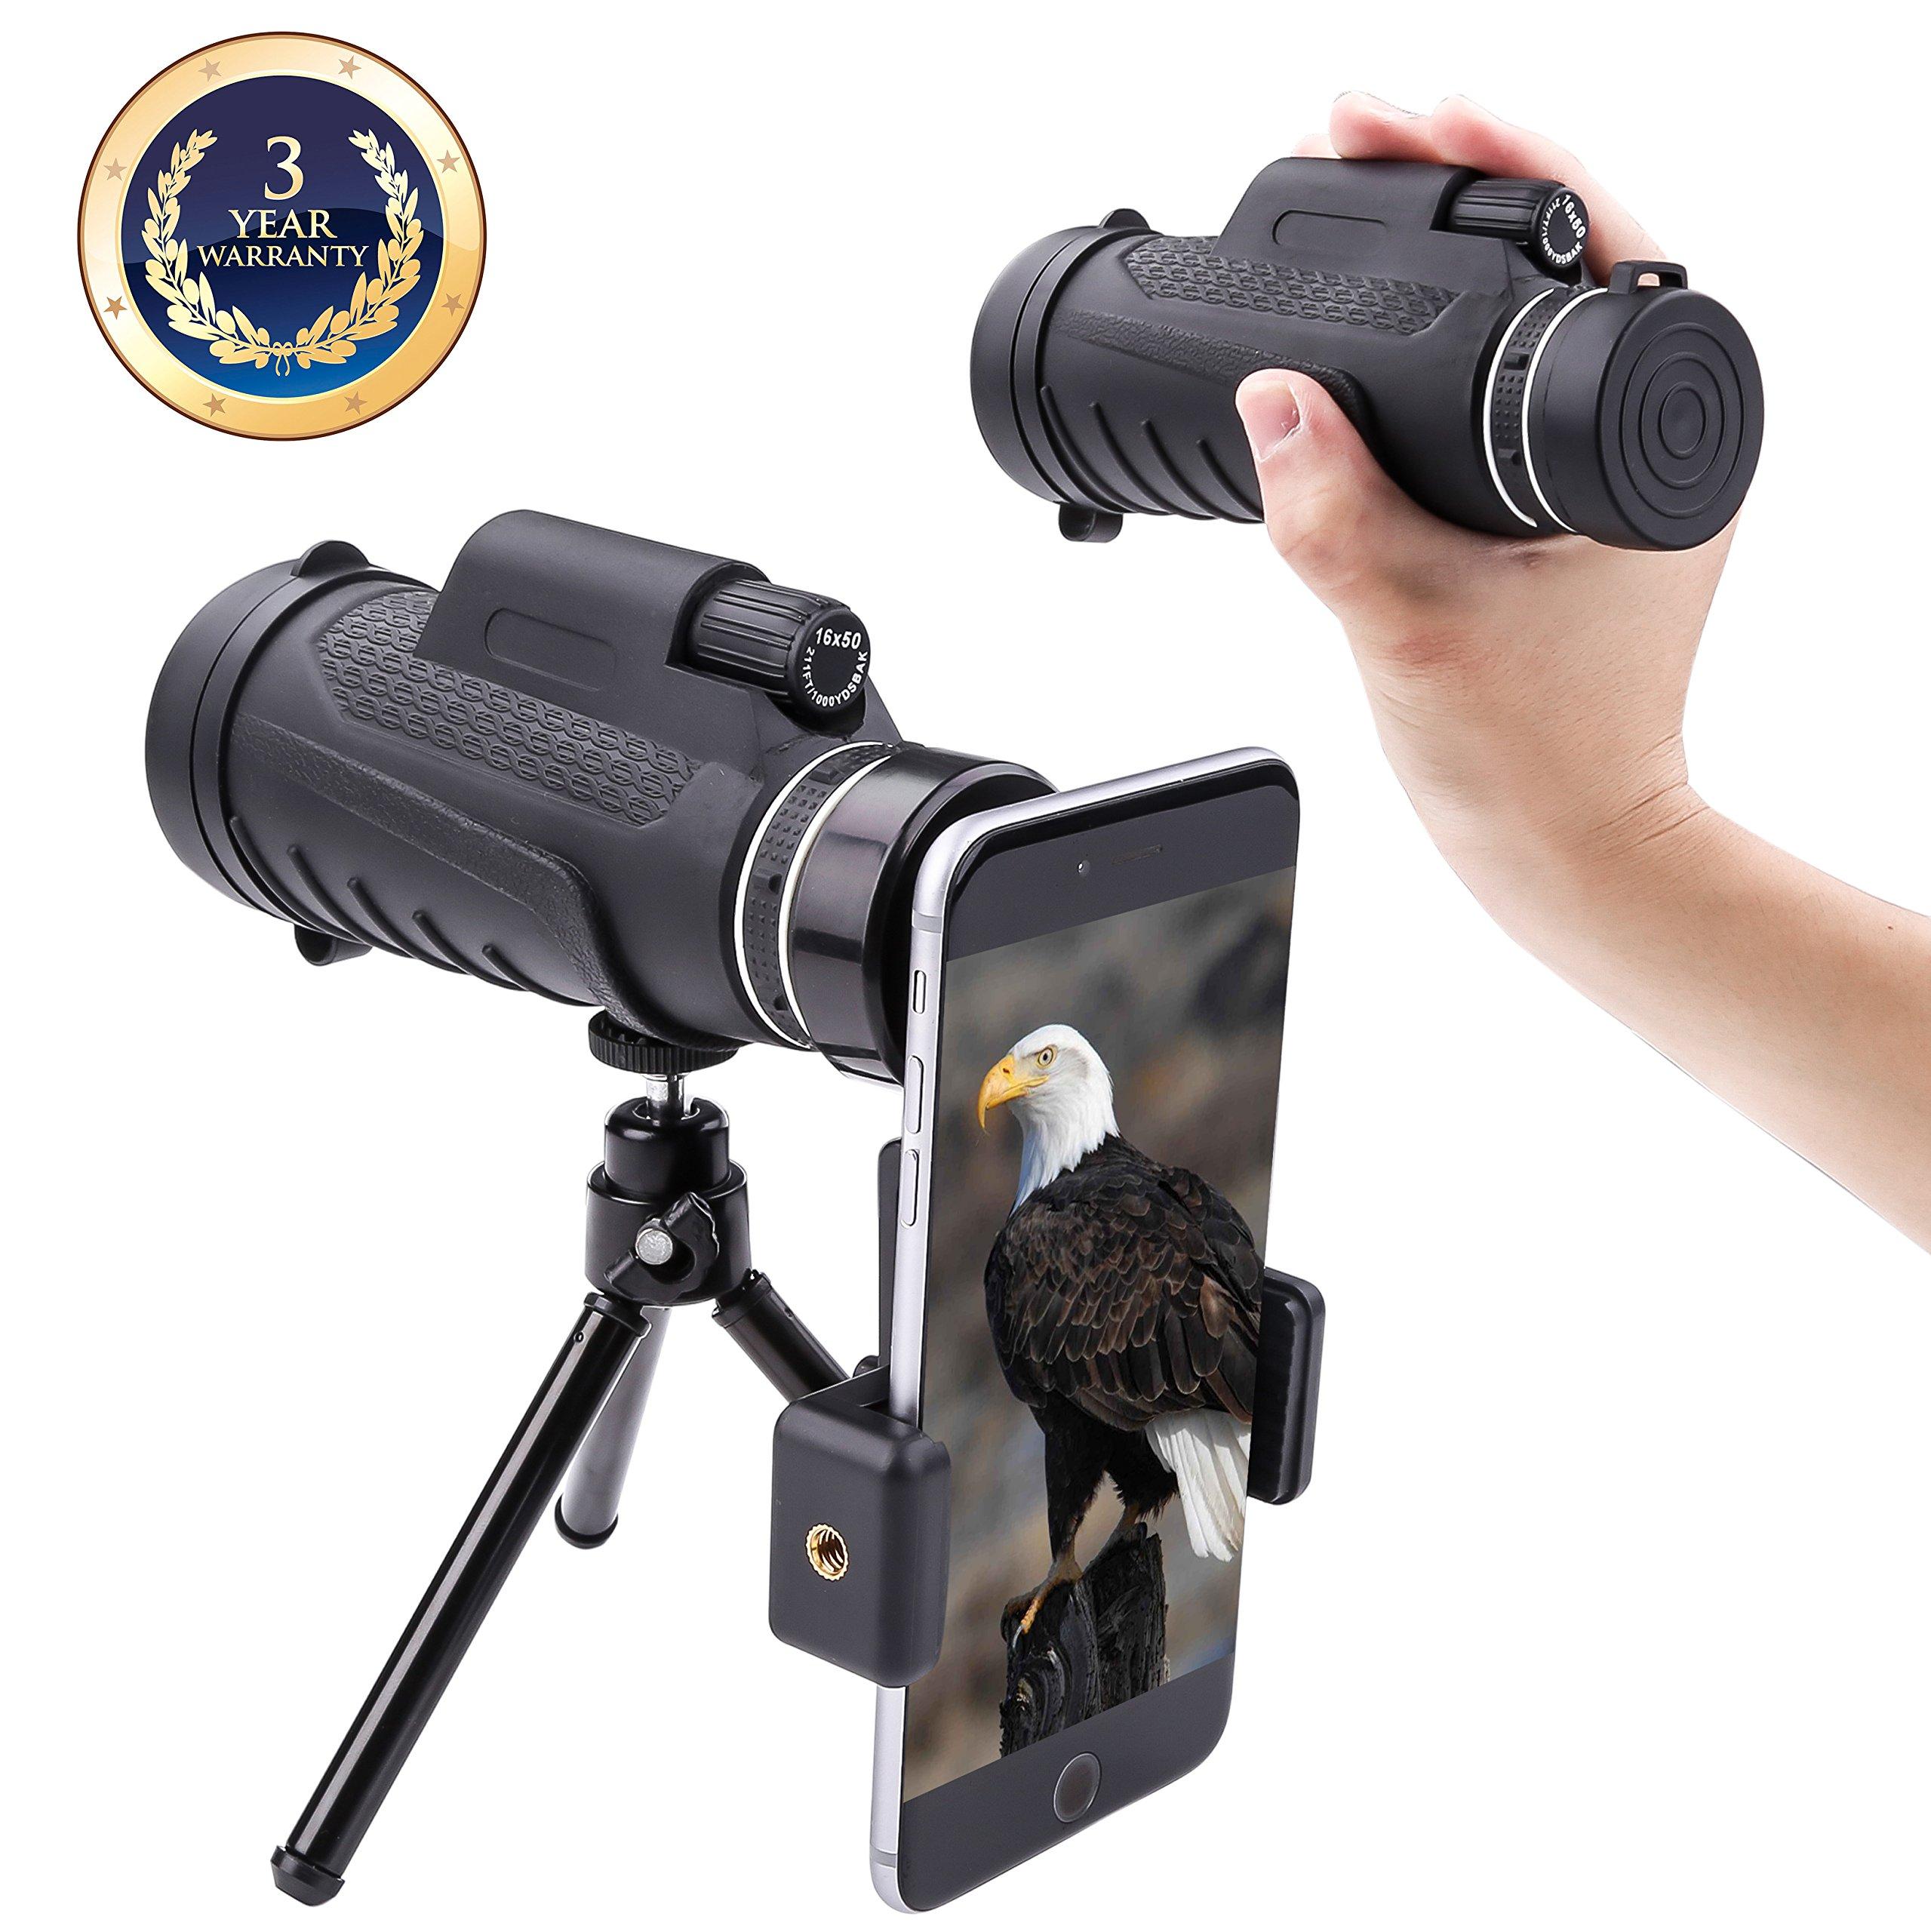 Monocular telescope Dual focus Prism Night Vision waterproof dustproof shockproof Scope for Bird Watching, Camping, Outdoor Hunting (black)